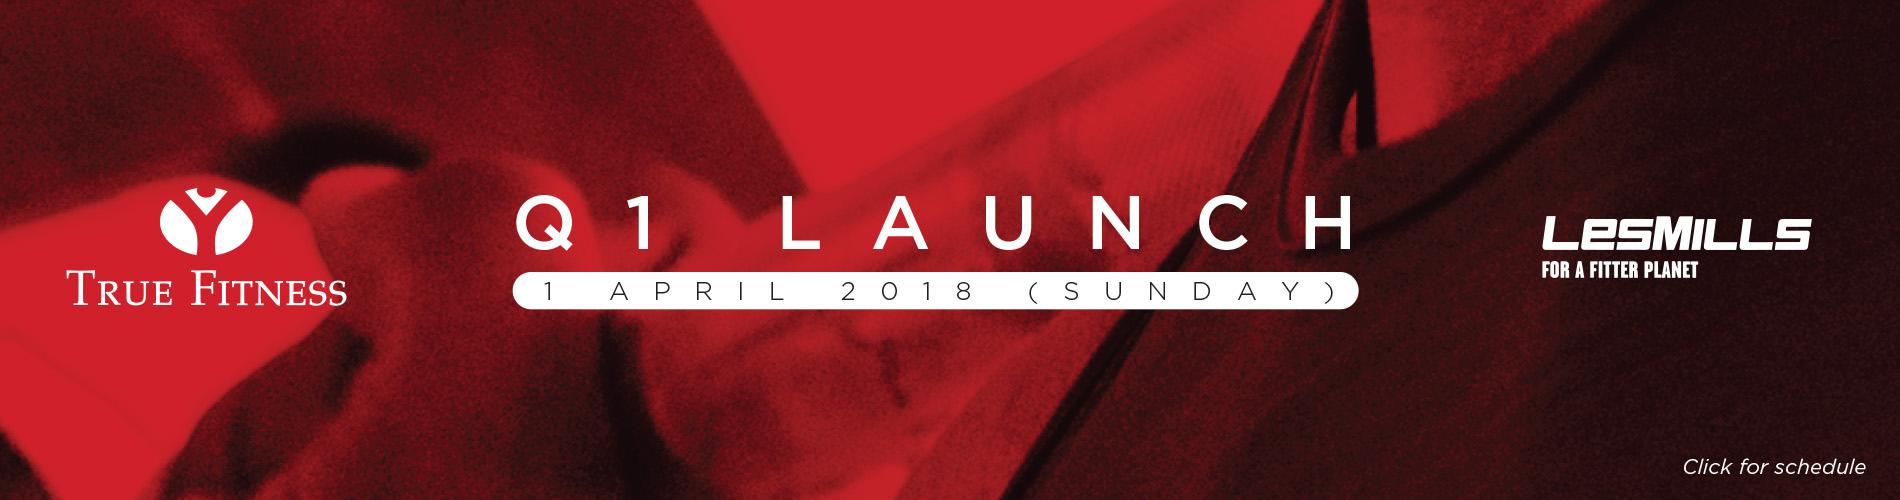 Les Mills Q1 Launch